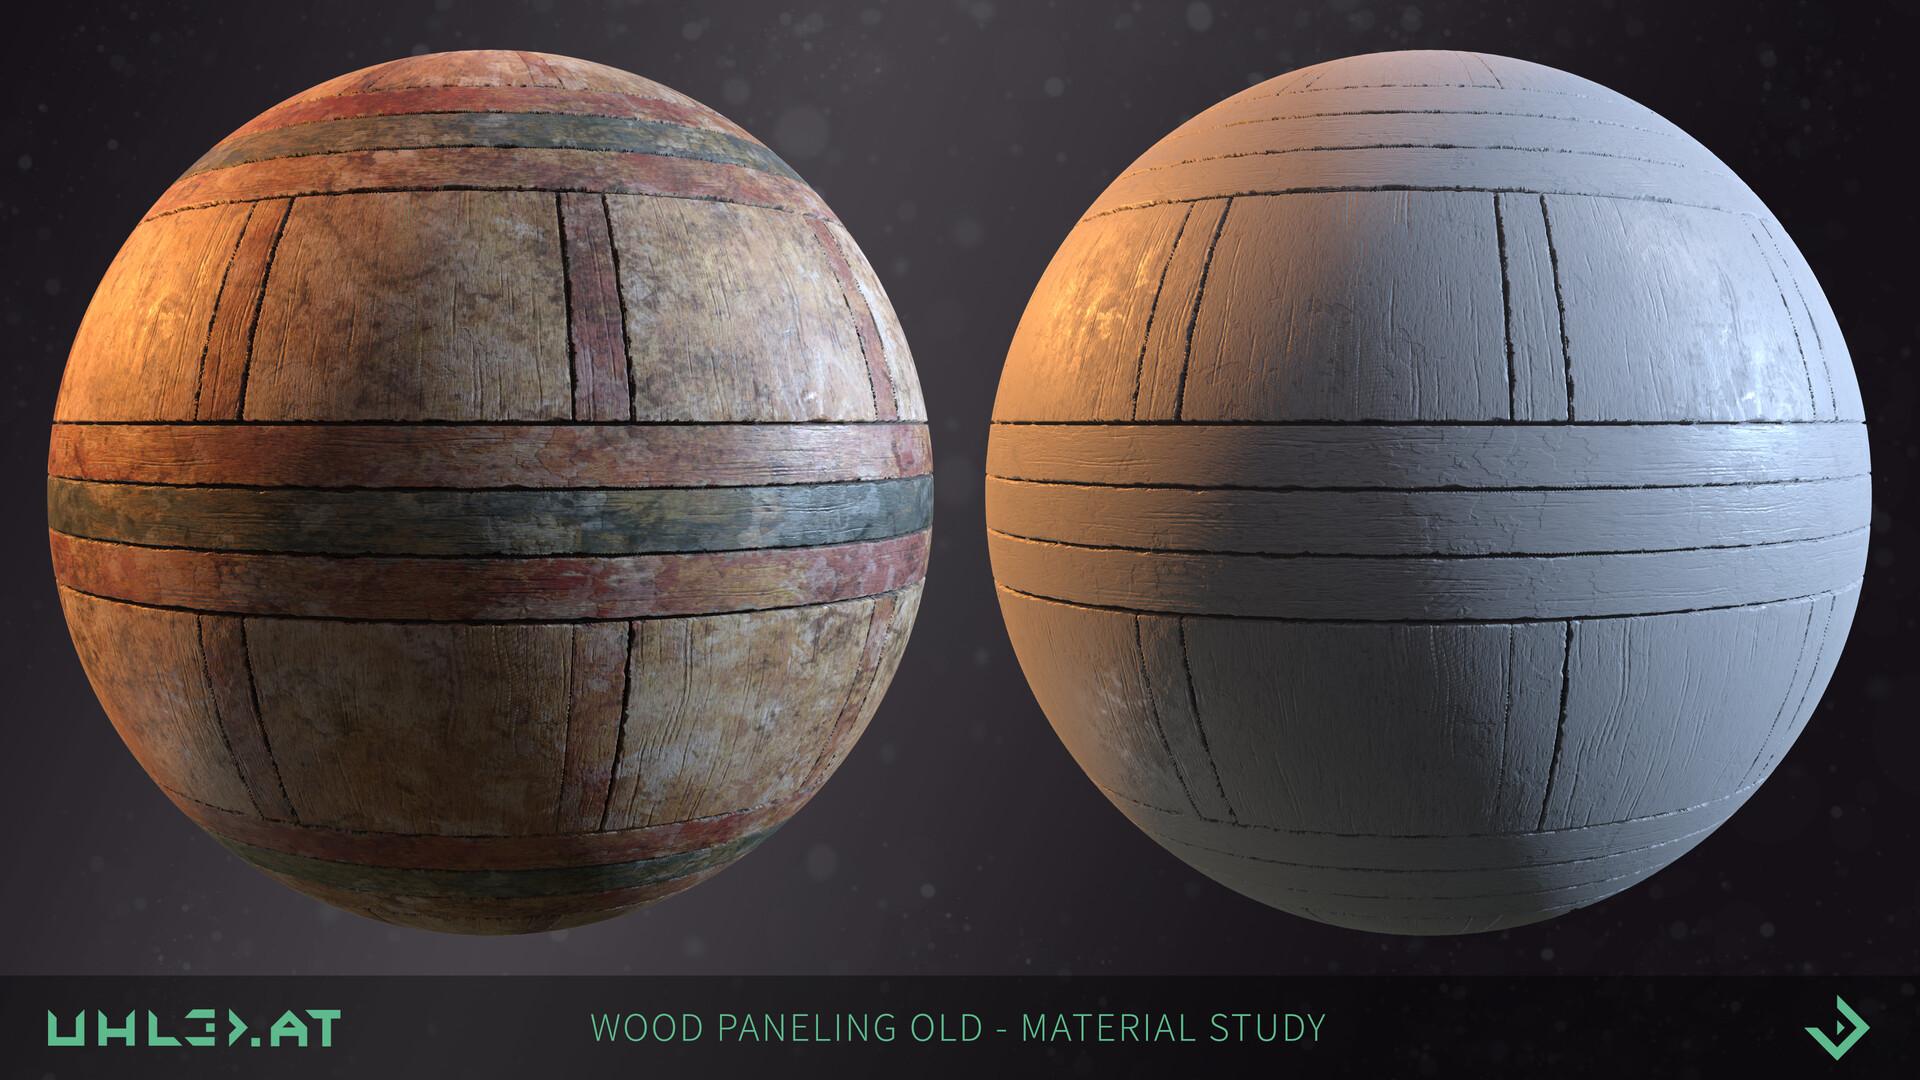 Dominik uhl wood paneling old 02